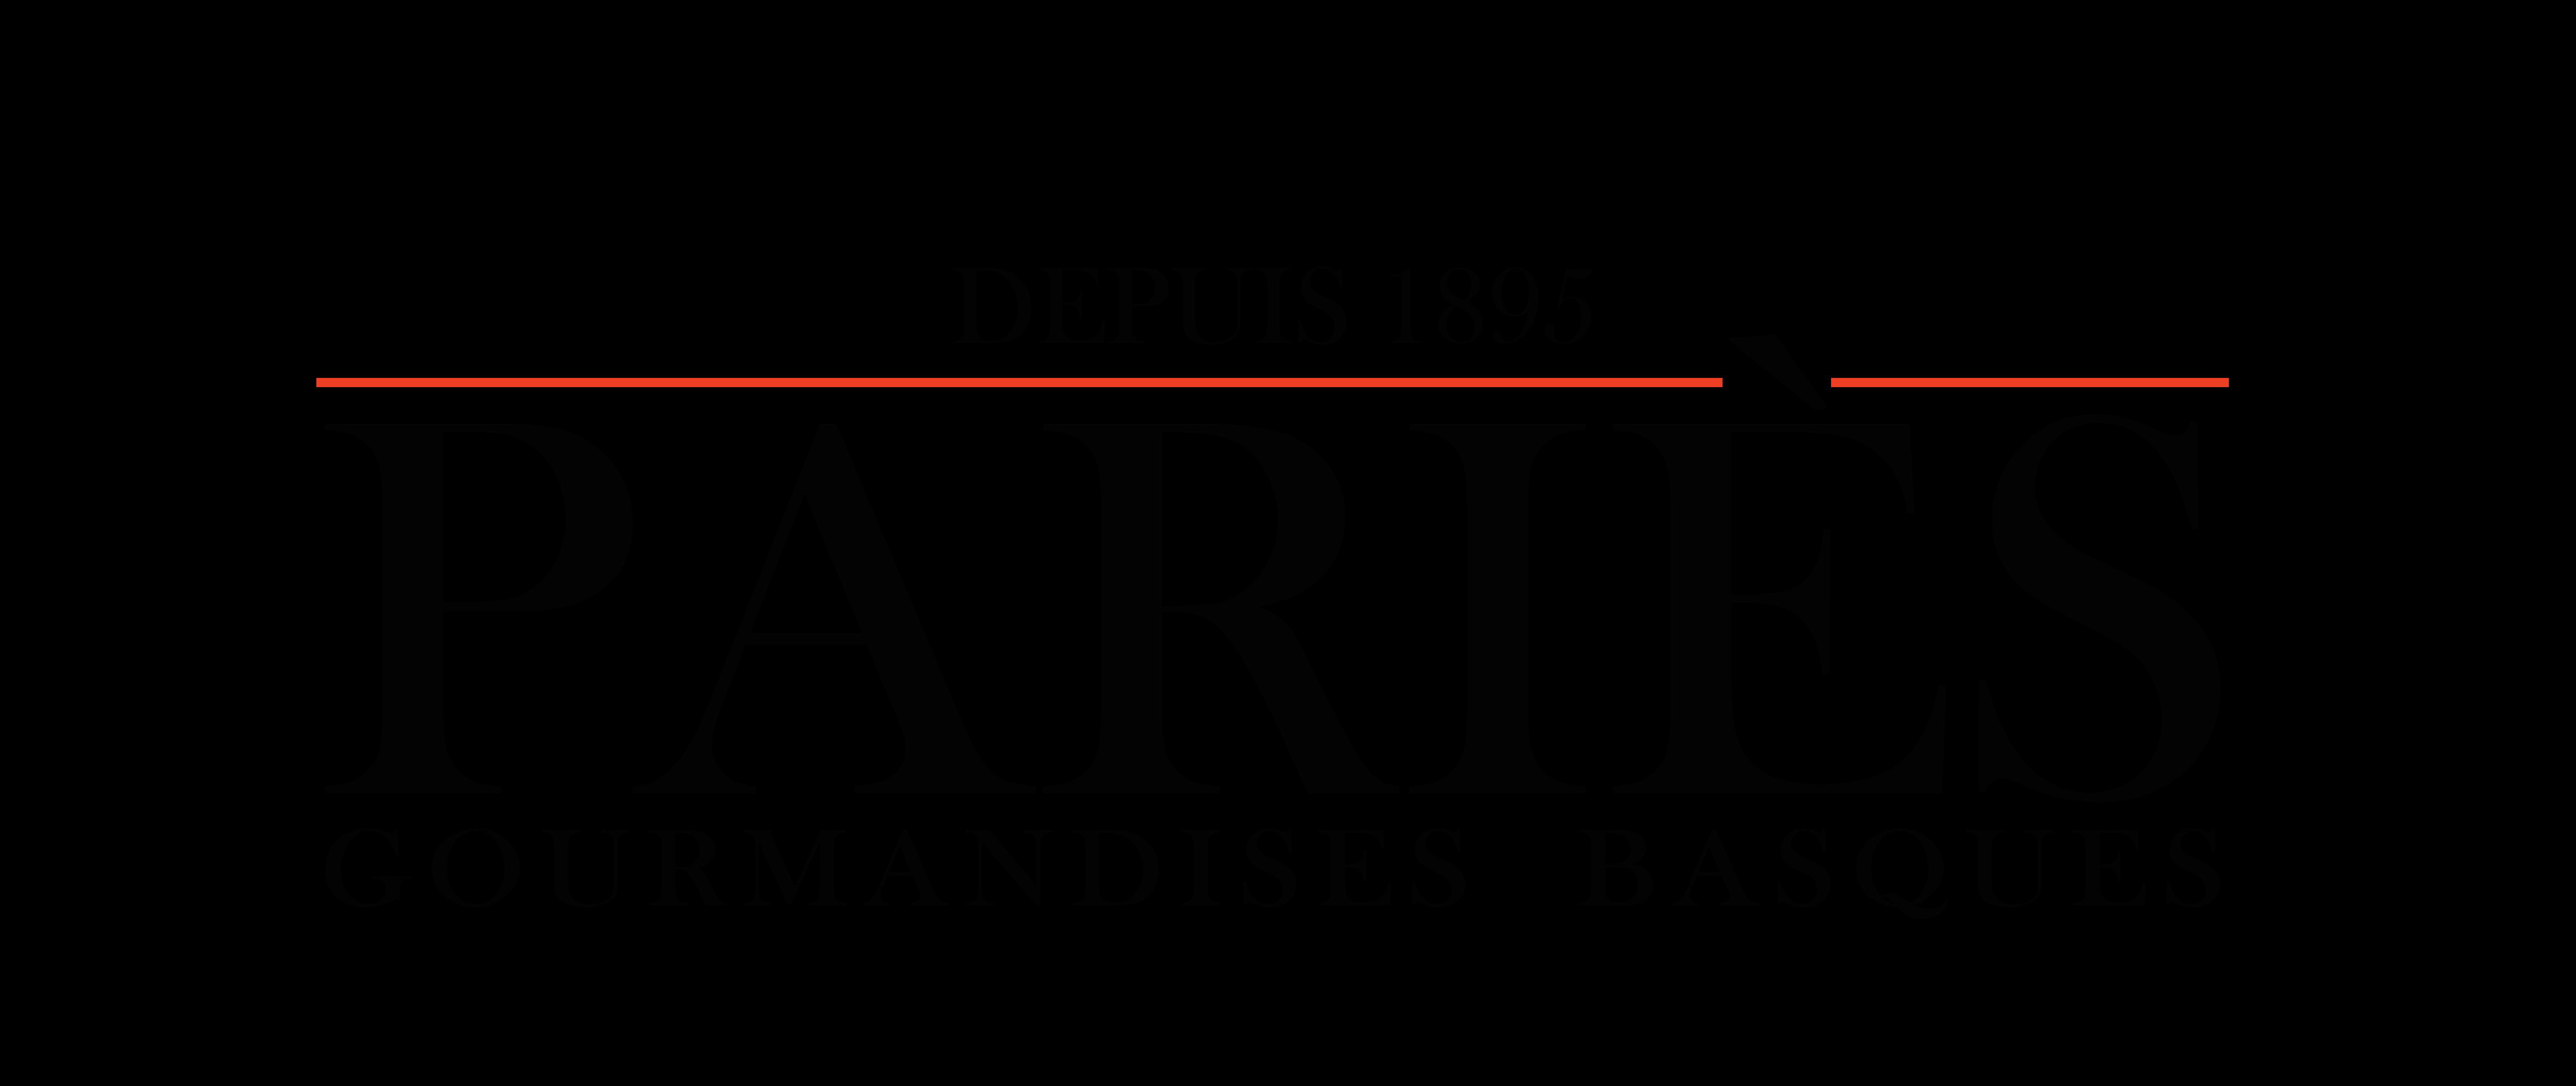 A 2017 logo